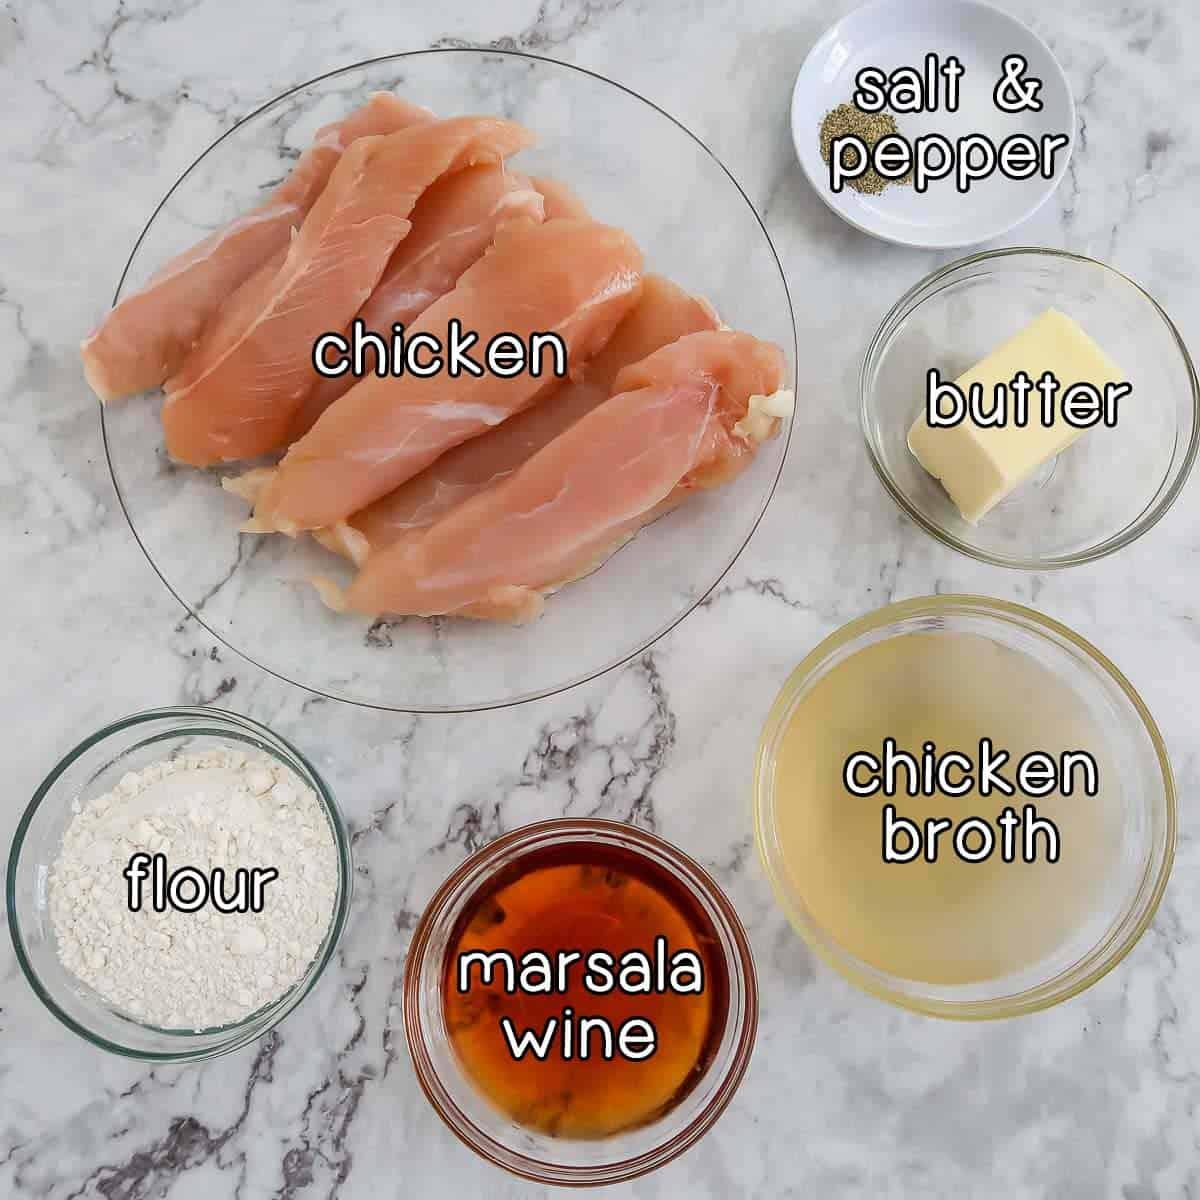 Overhead shot of ingredients- chicken, salt and pepper, butter, chicken broth, marsala wine, and flour.